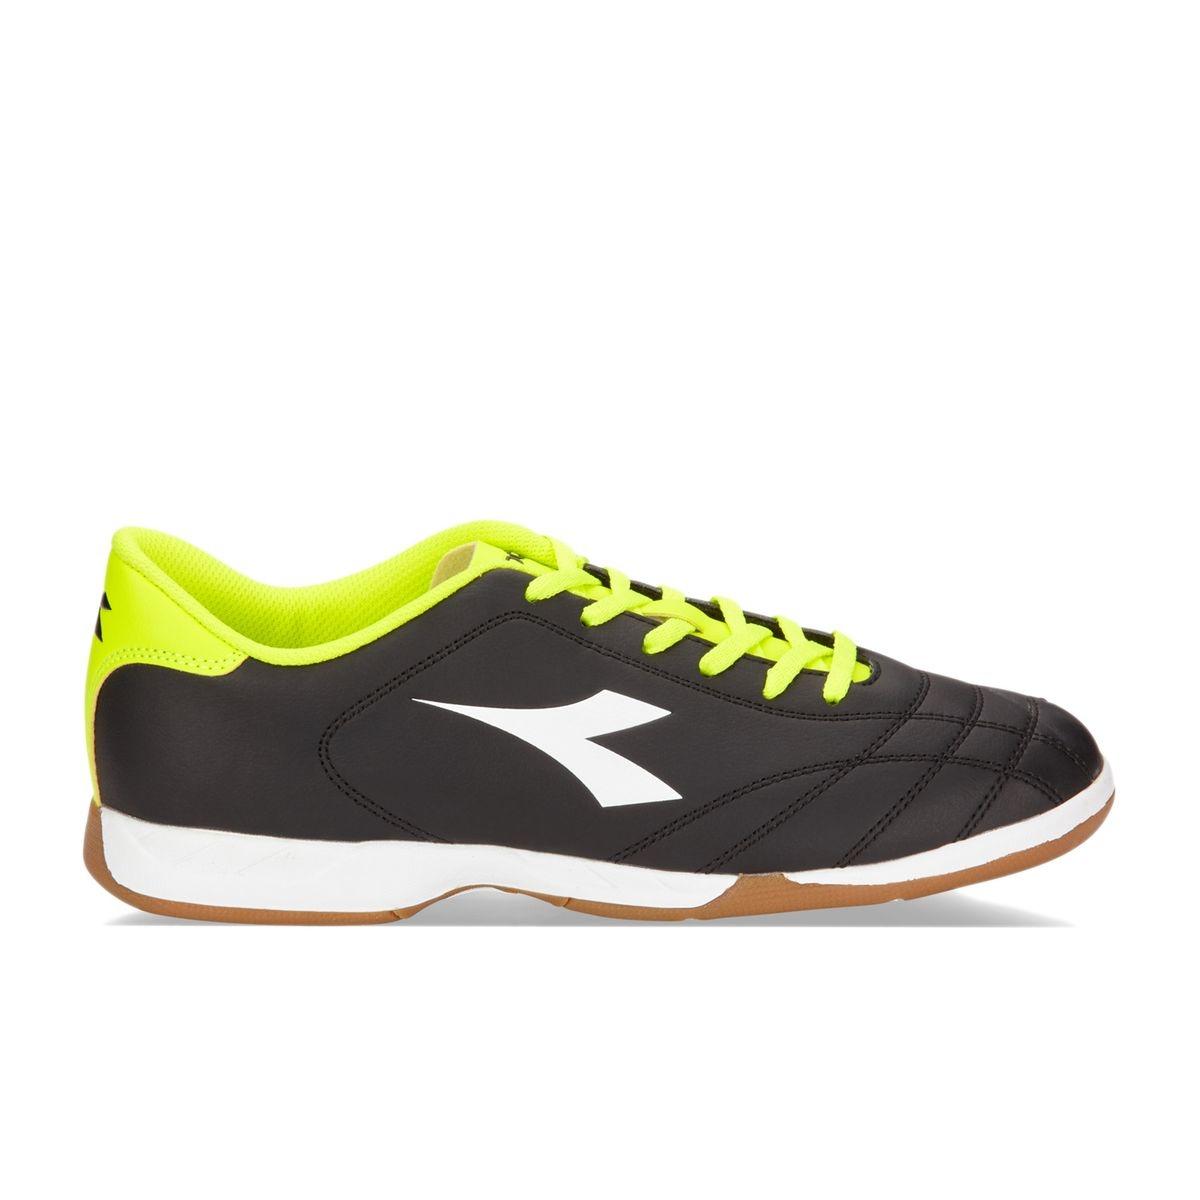 Chaussure de football 6PLAY ID